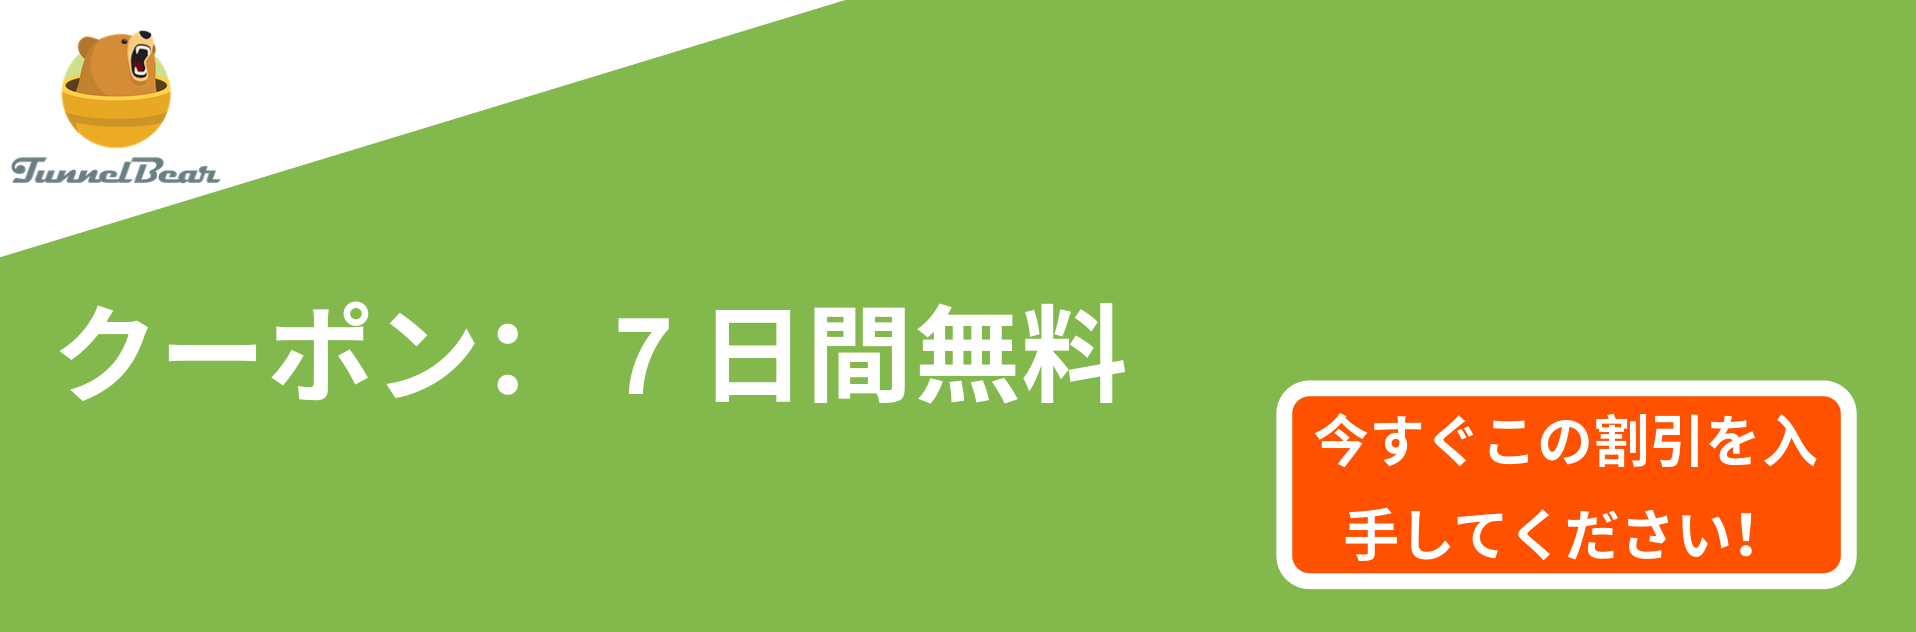 TunnelBear VPNクーポンバナー-7日間無料